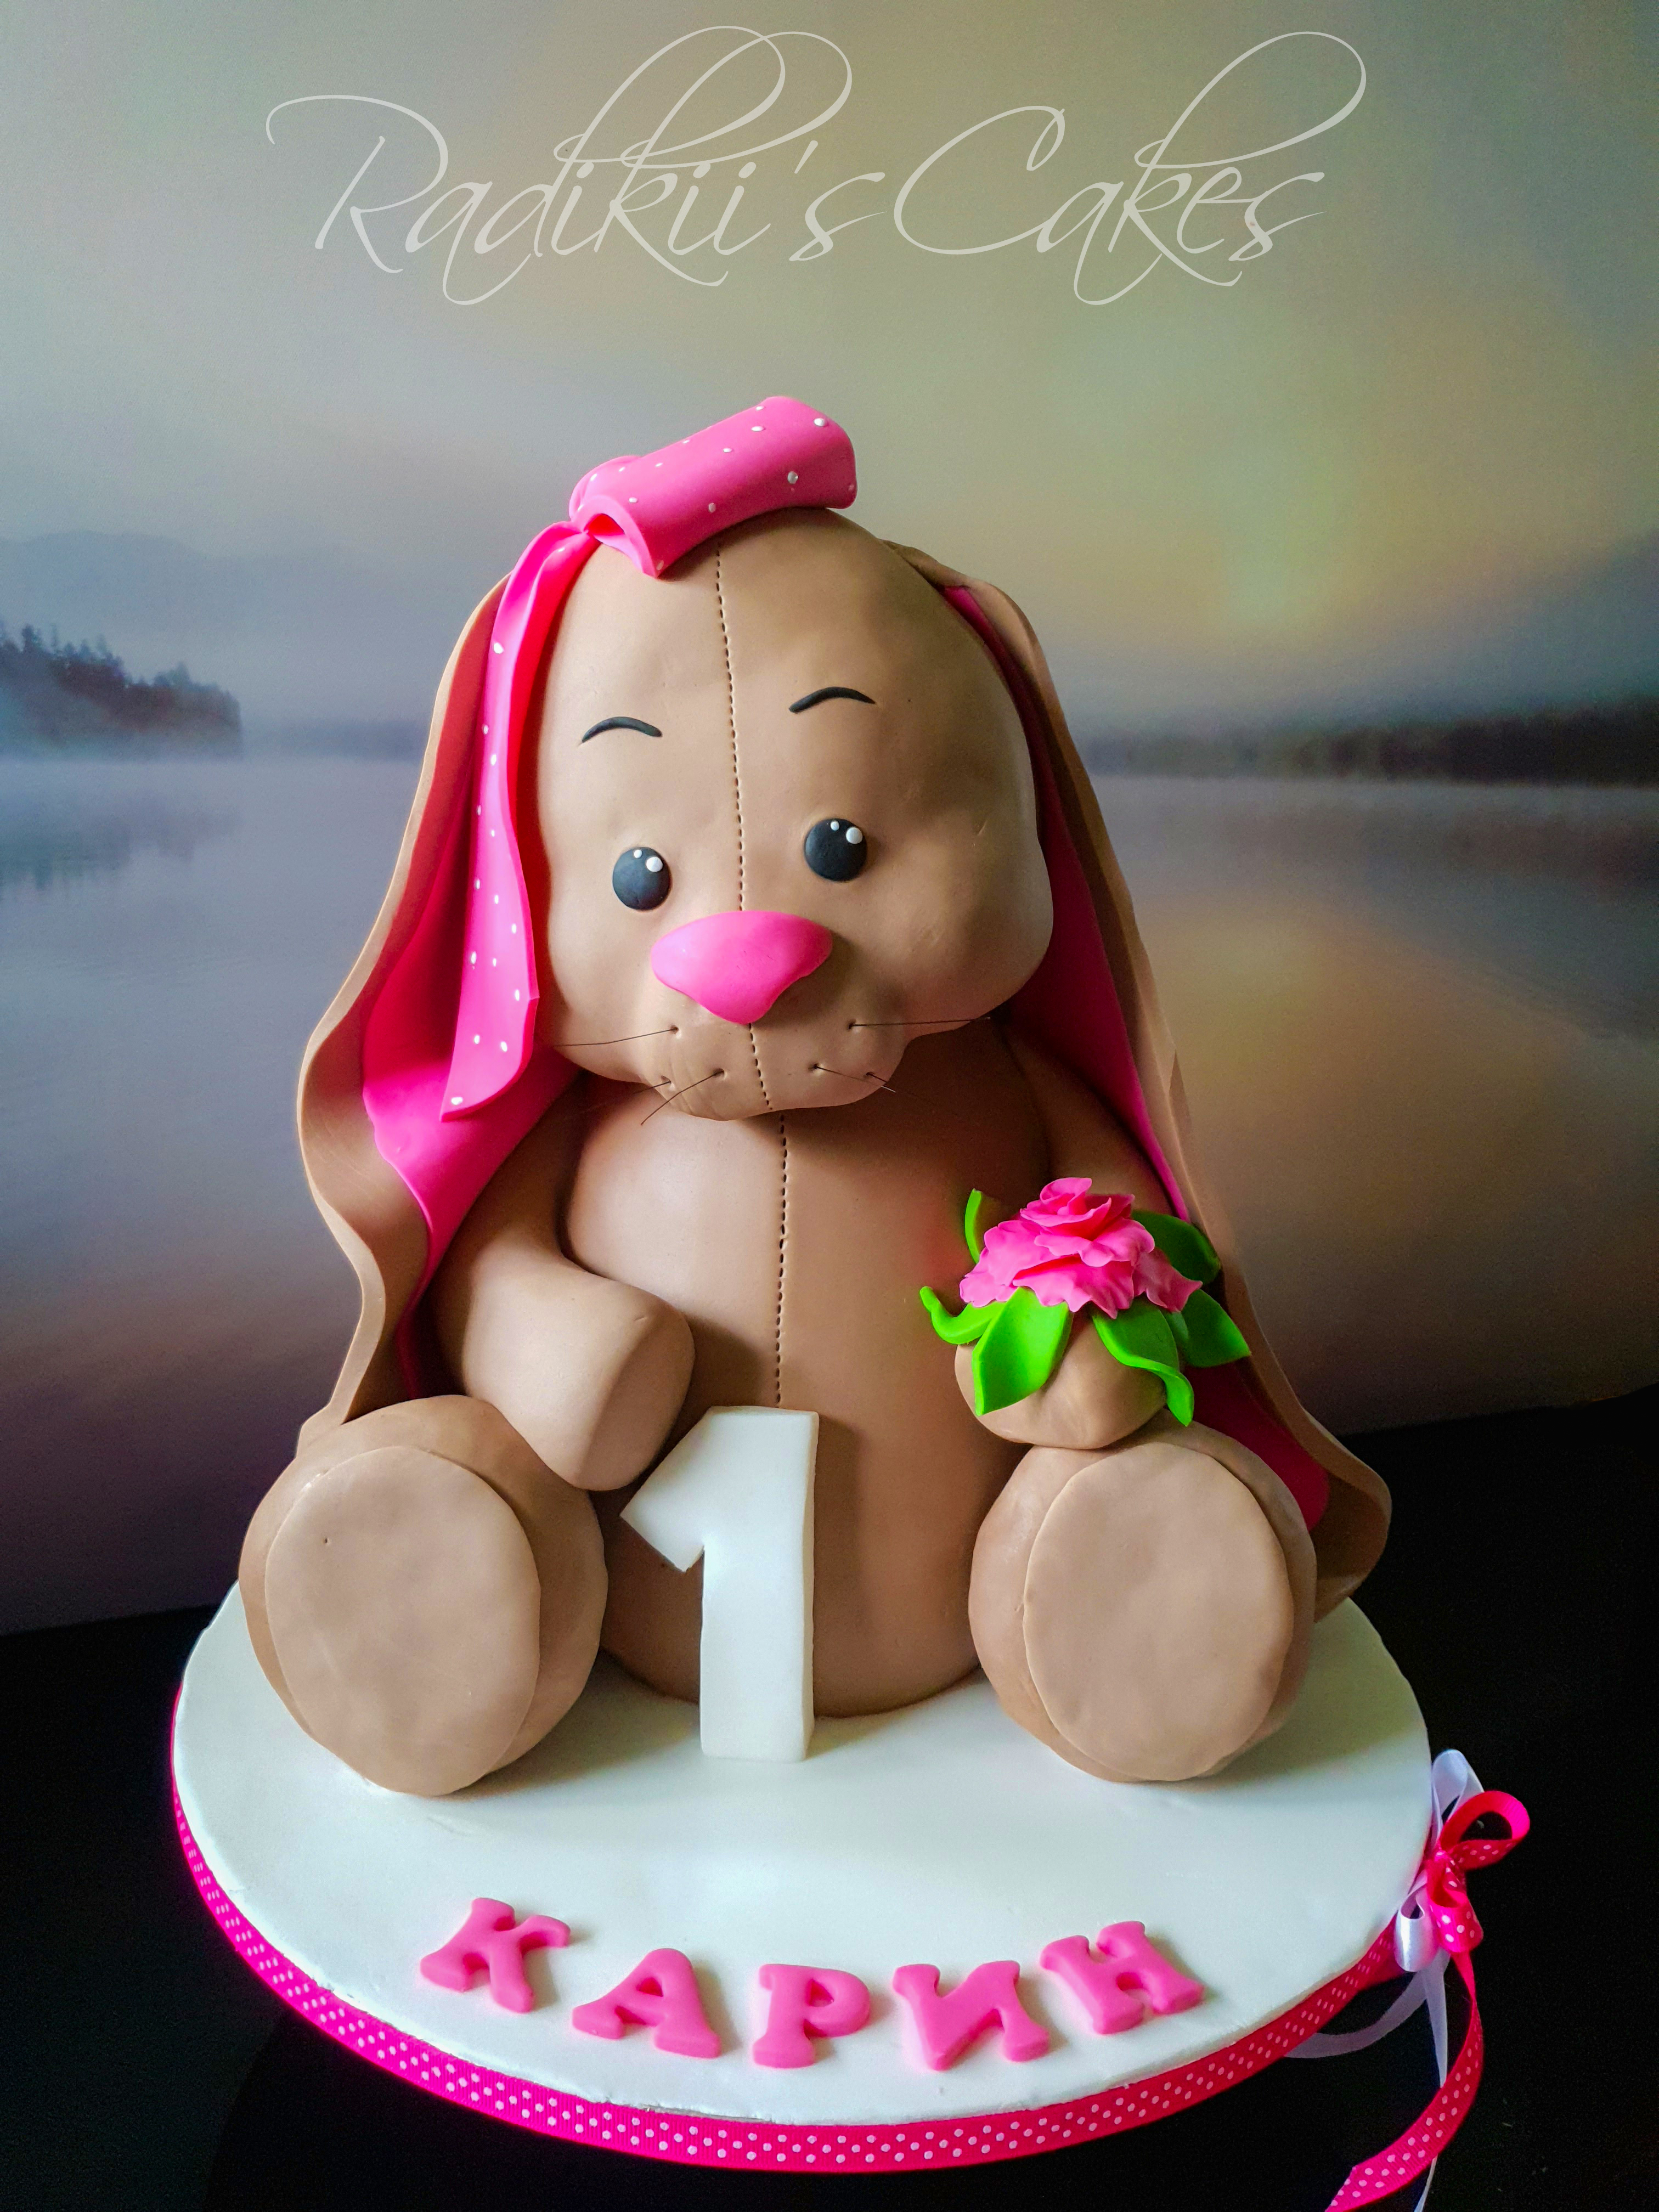 3D Bunny cake